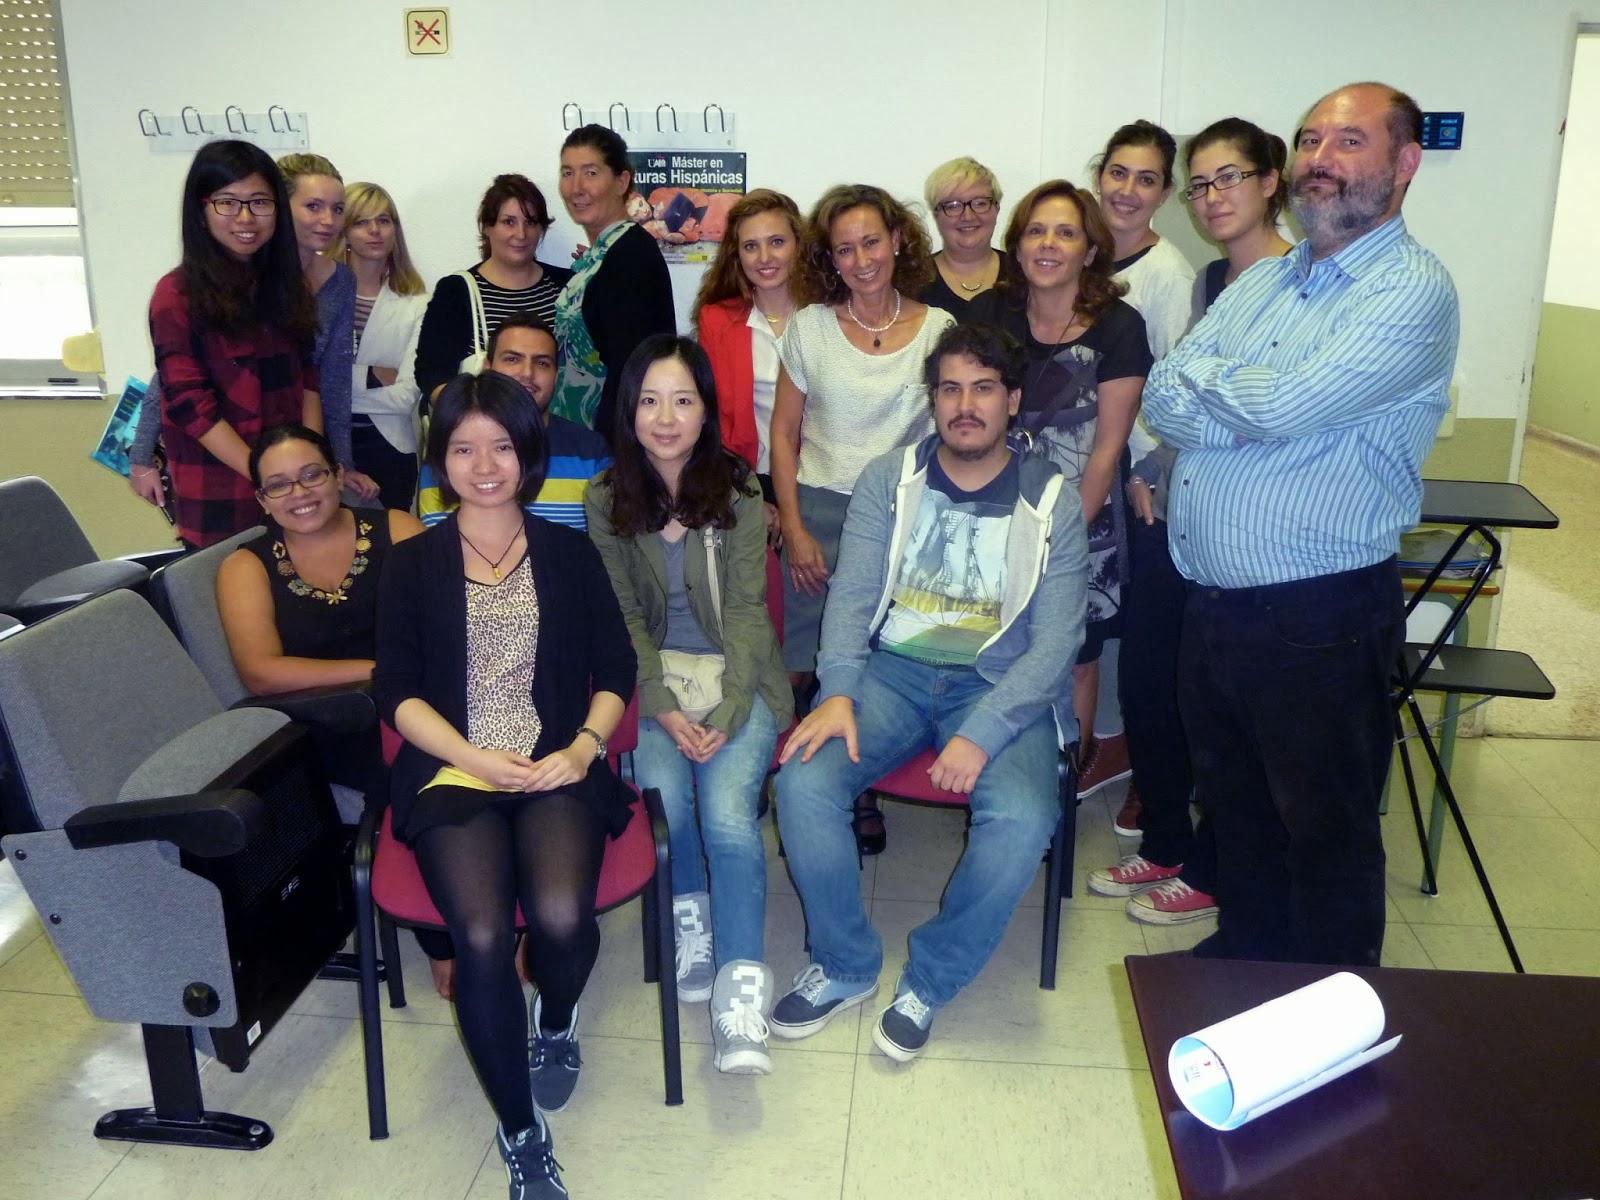 Carmen Valcárcel, Máster en Literaturas Hispánicas, Universidad Autónoma de Madrid